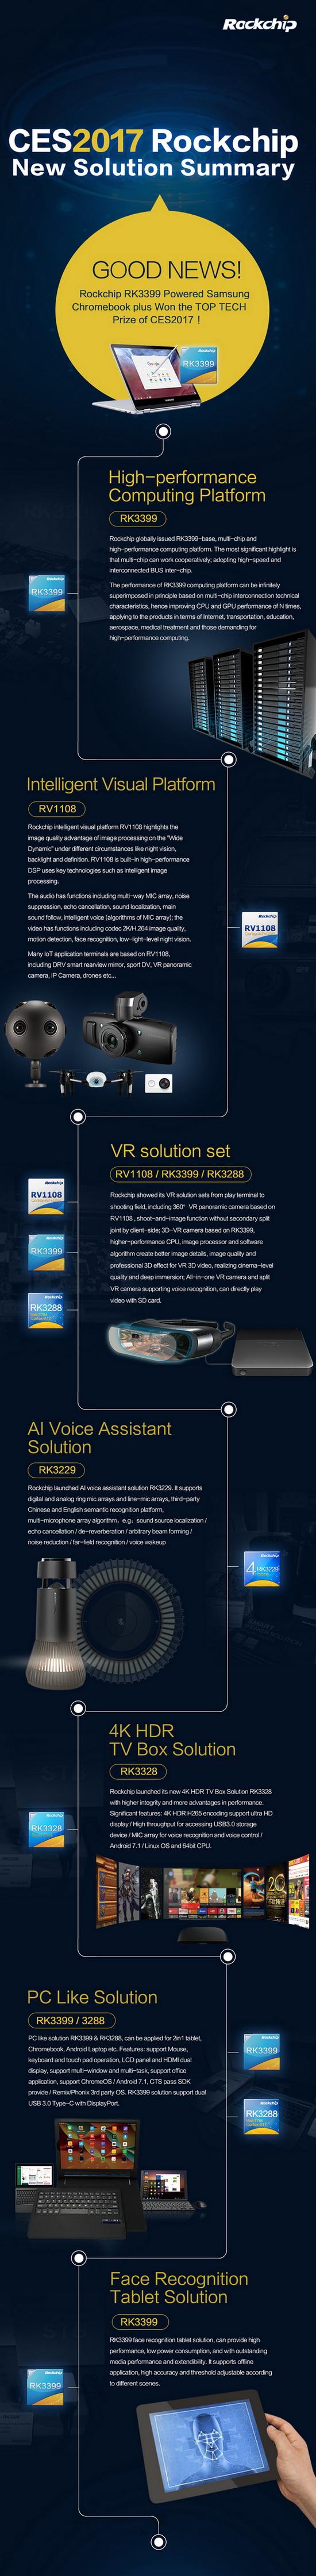 32097749262_9e5433e865_o One single picture to show you Rockchip tech highlights of CES2017 Technology